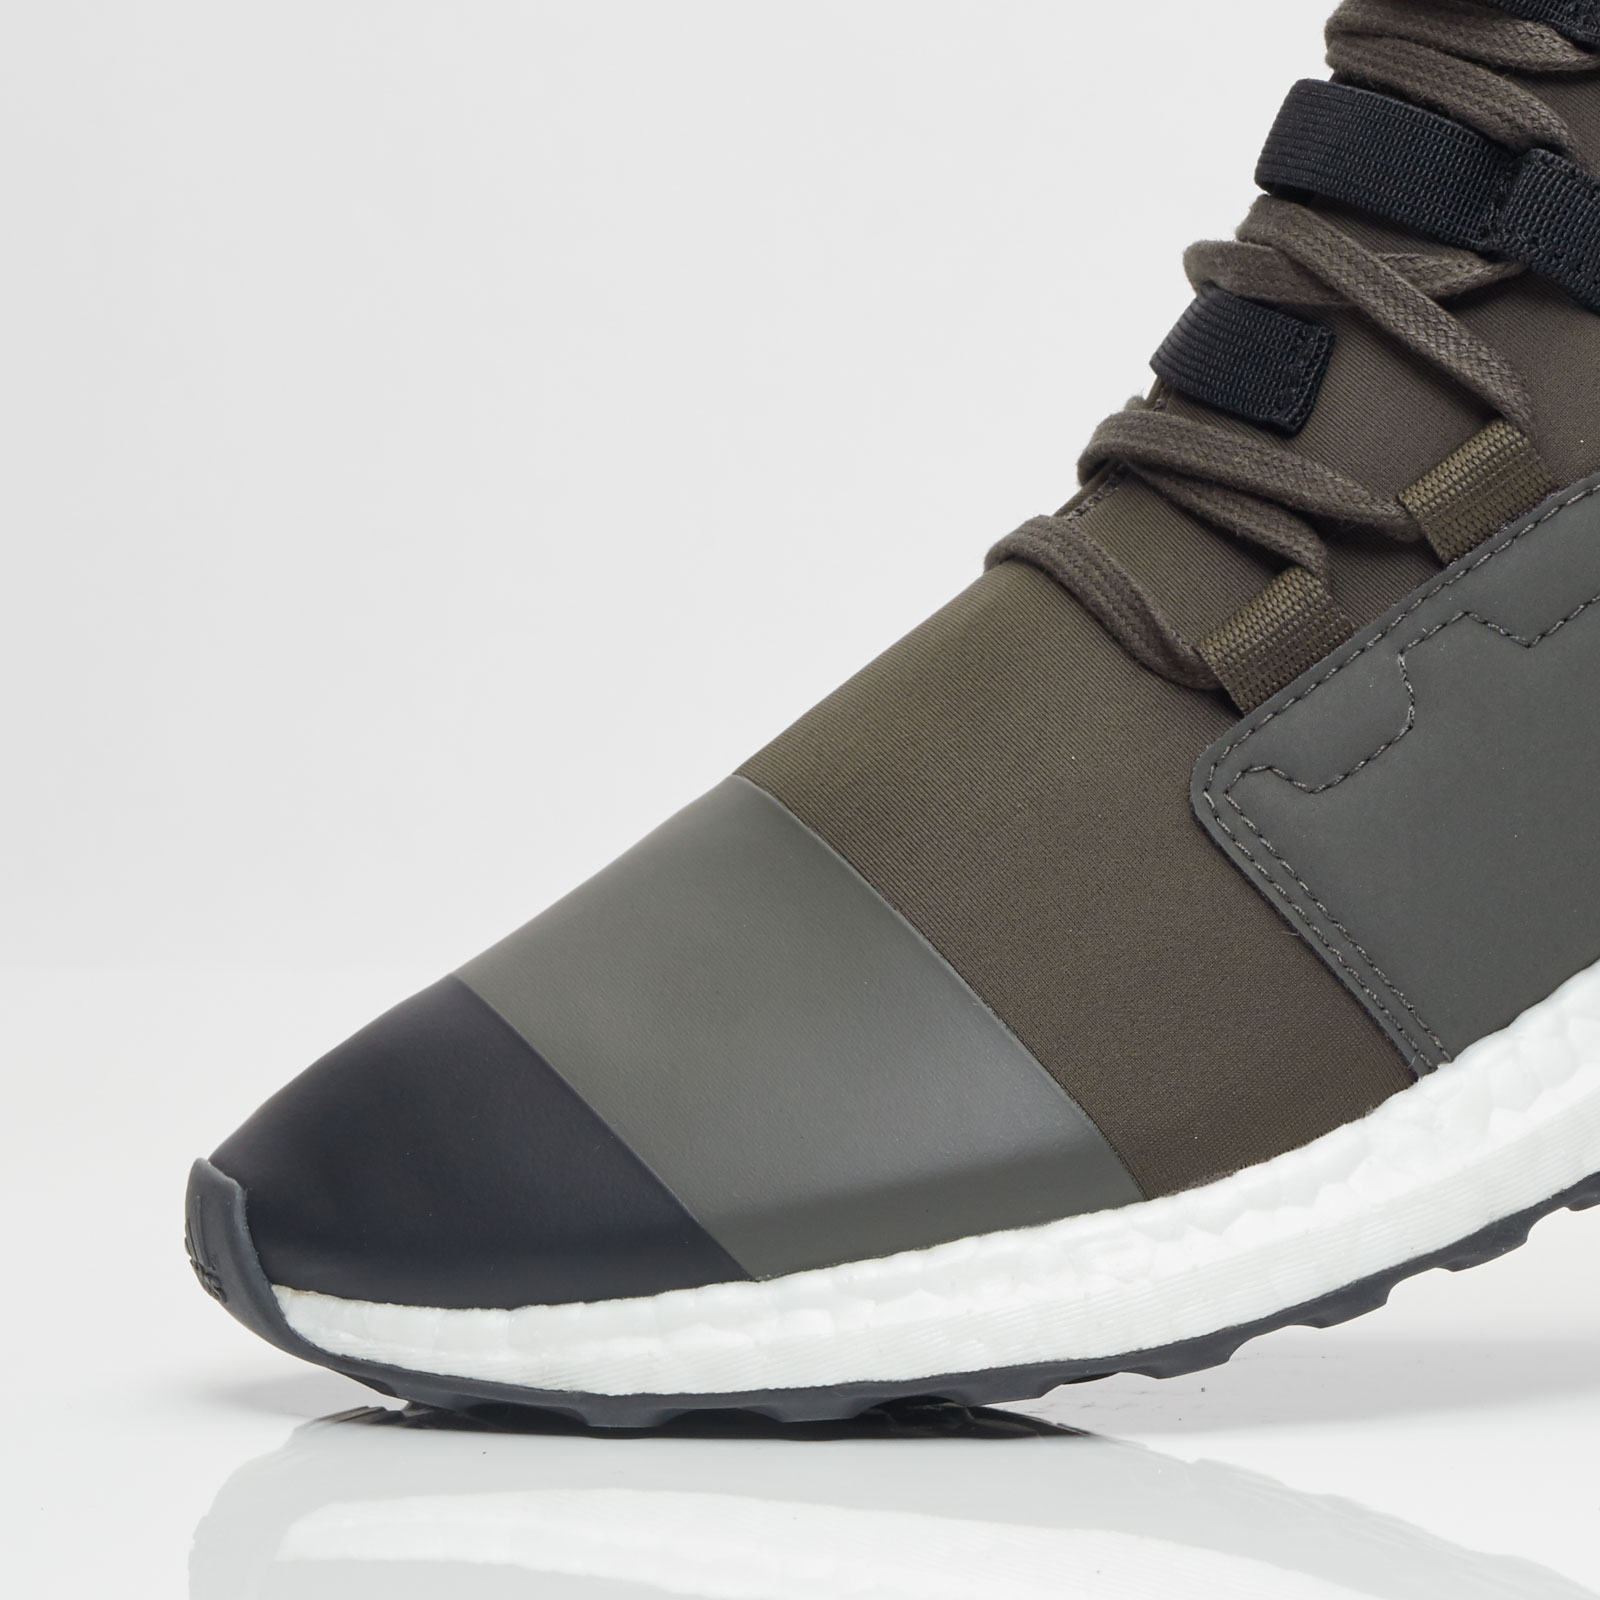 07a2f3d33515 adidas Kozoko Low - Cg3161 - Sneakersnstuff